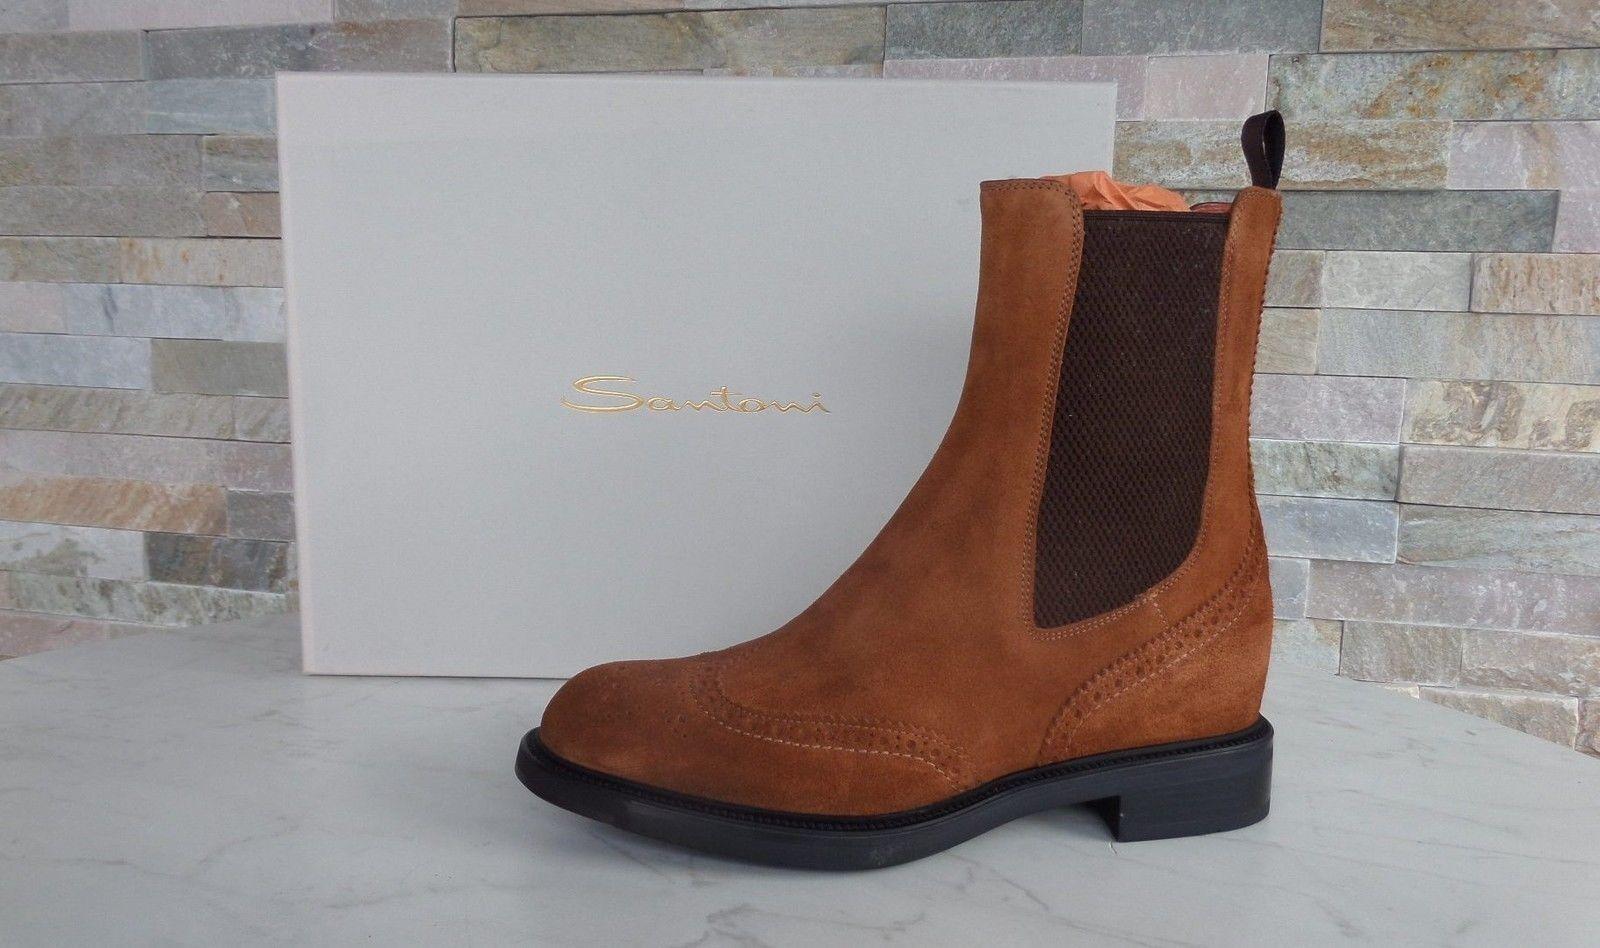 LUSSO Santoni Taglia 37 Stivaletti Stivali Stivali Booties Scarpe Cognac Nuovo UVP